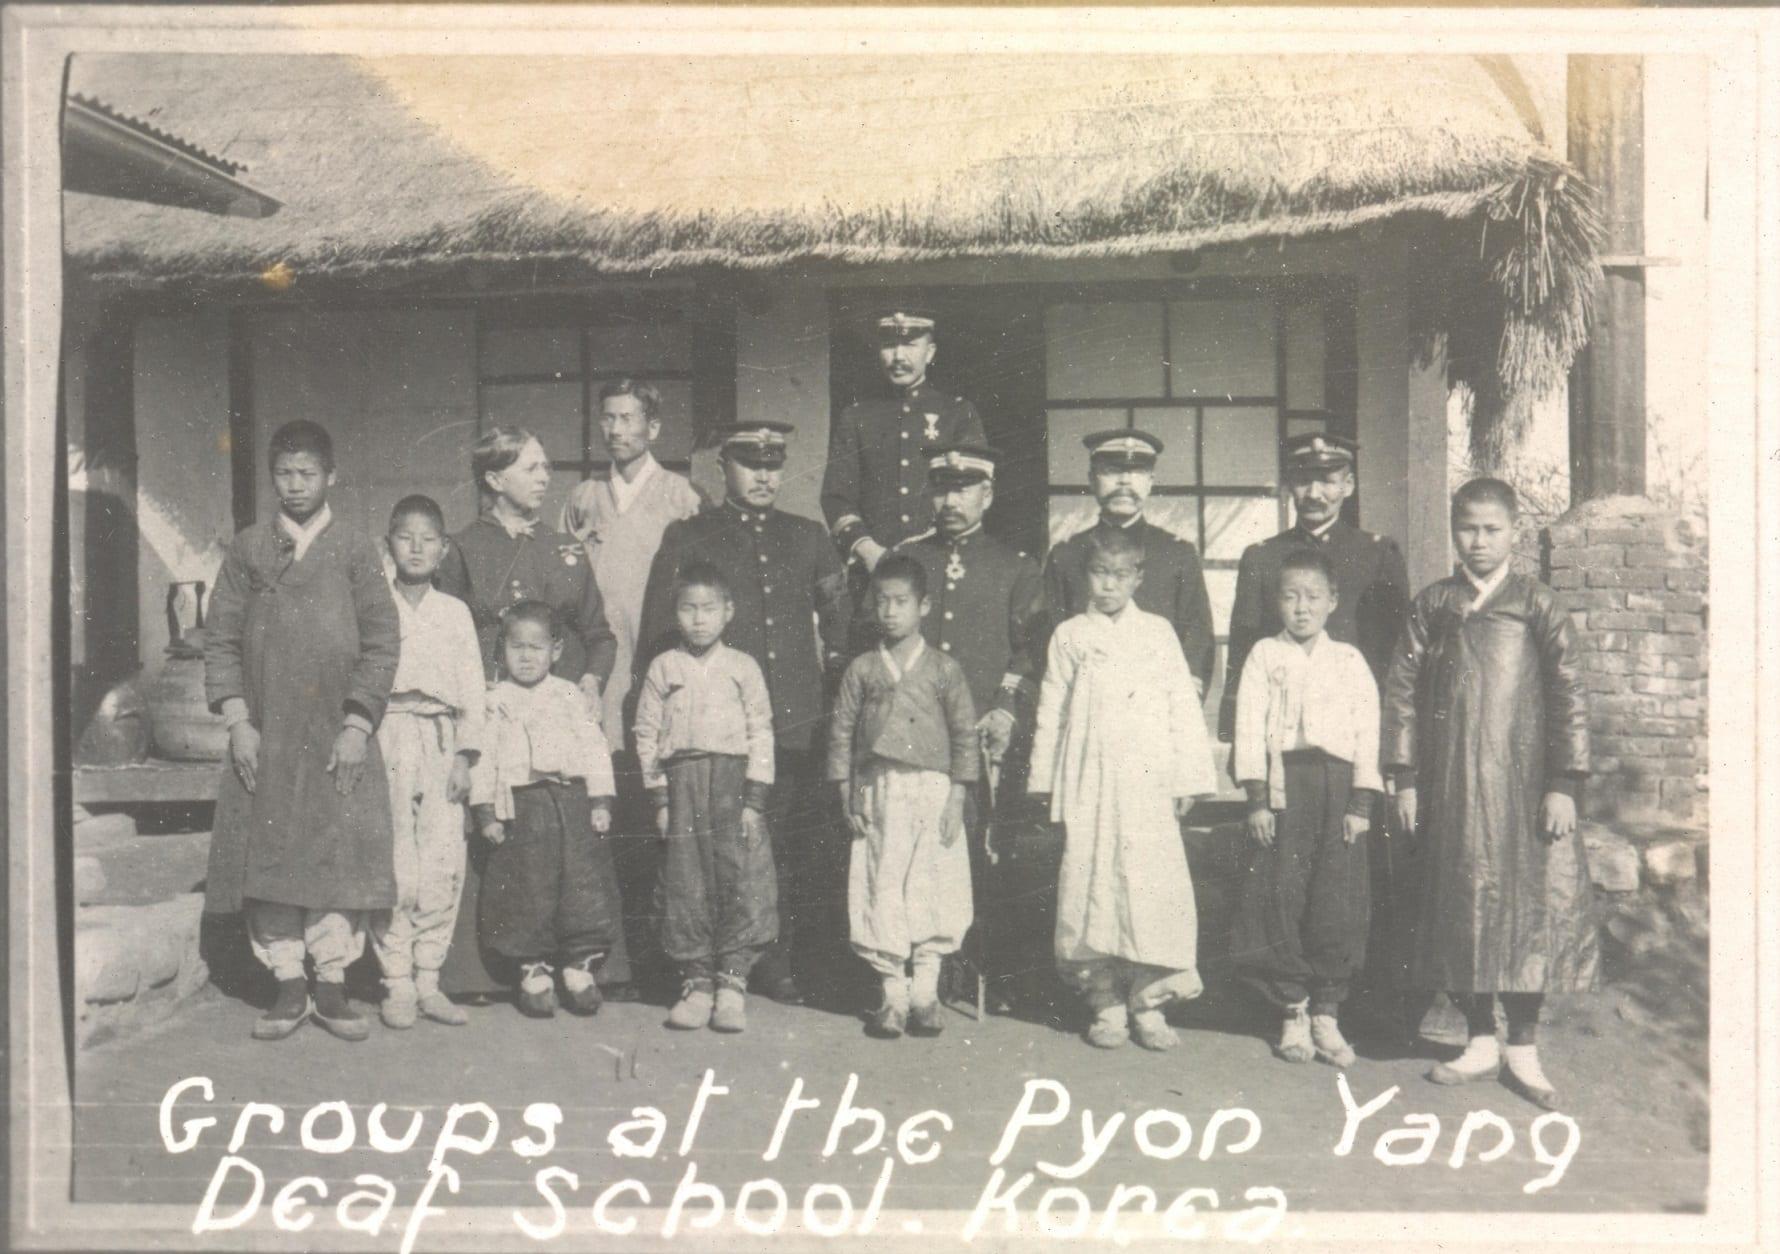 Rosetta Hall Pyong Yang Boys a